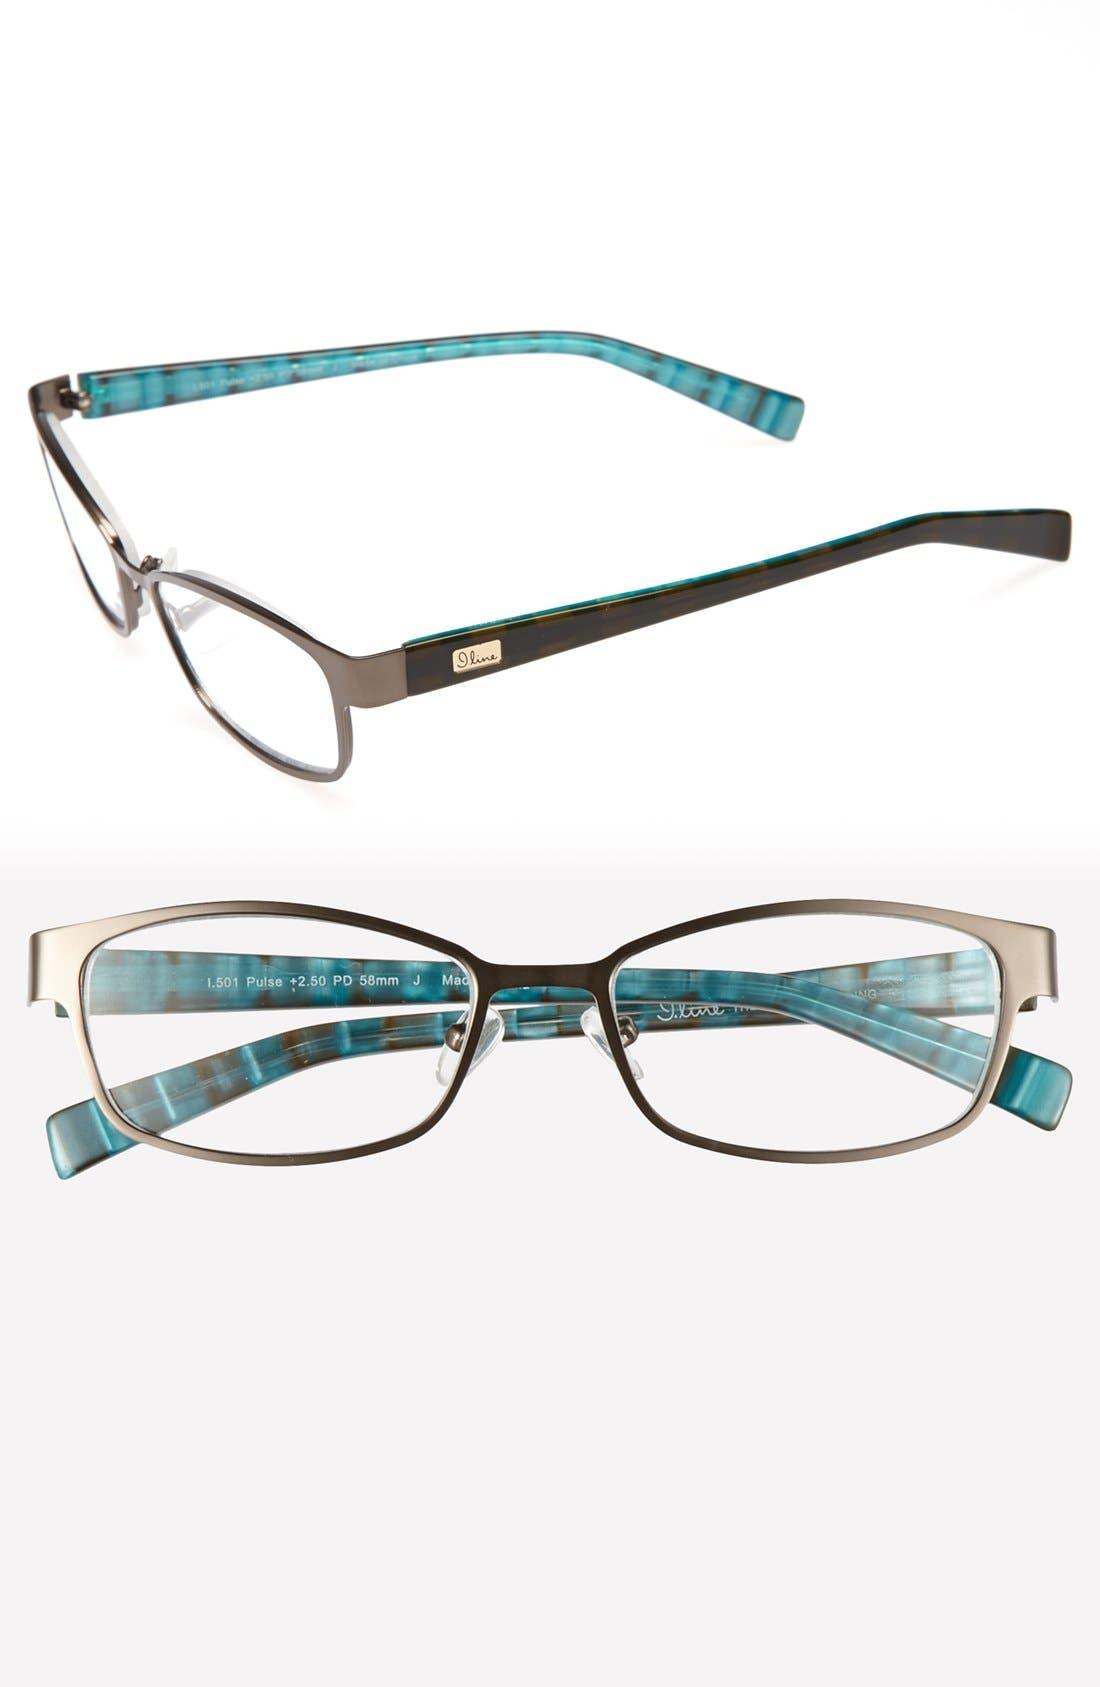 Main Image - I Line Eyewear 'Pulse' 52mm Reading Glasses (2 for $88)